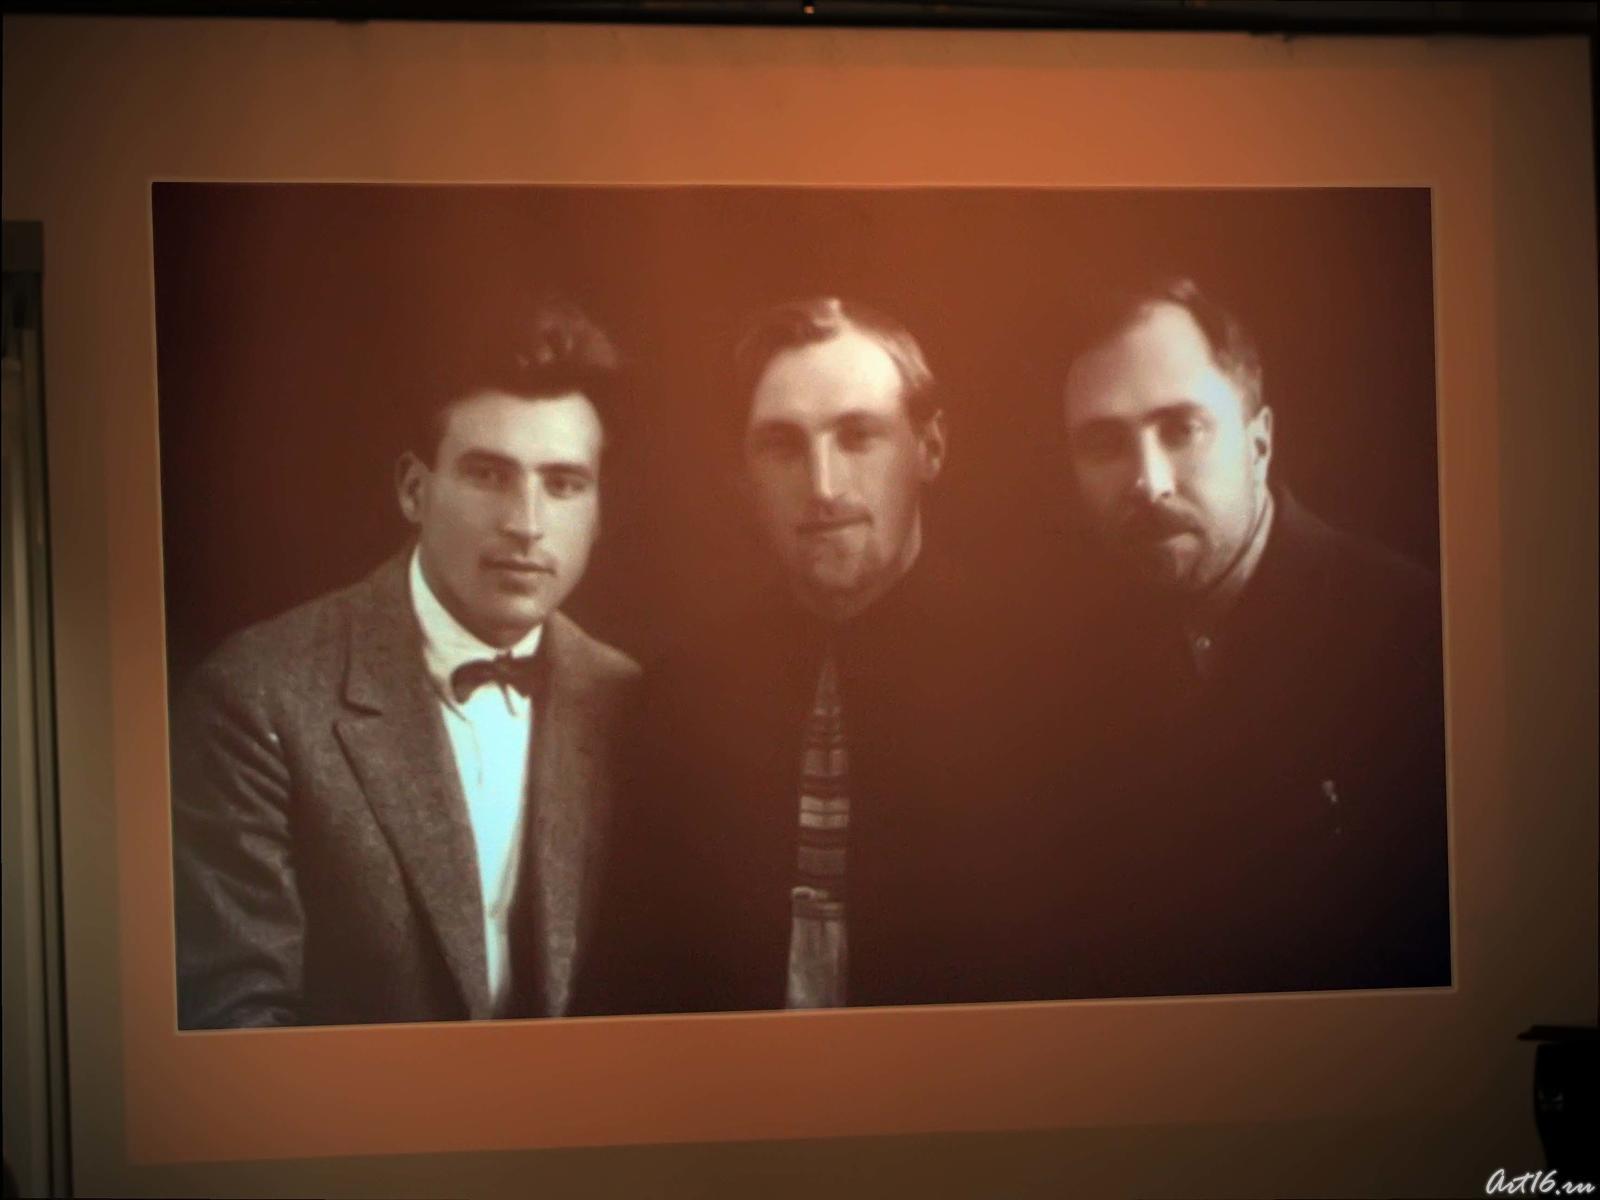 Фото №39789. На экране фото из архива Воробьевых